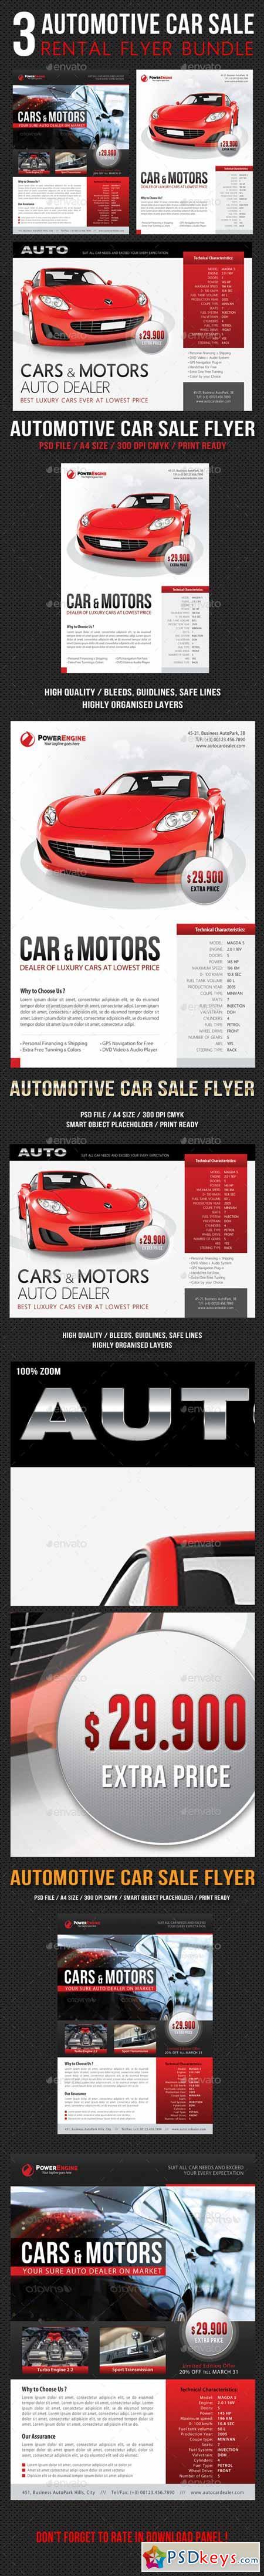 car rental flyer template – Car Sale Flyer